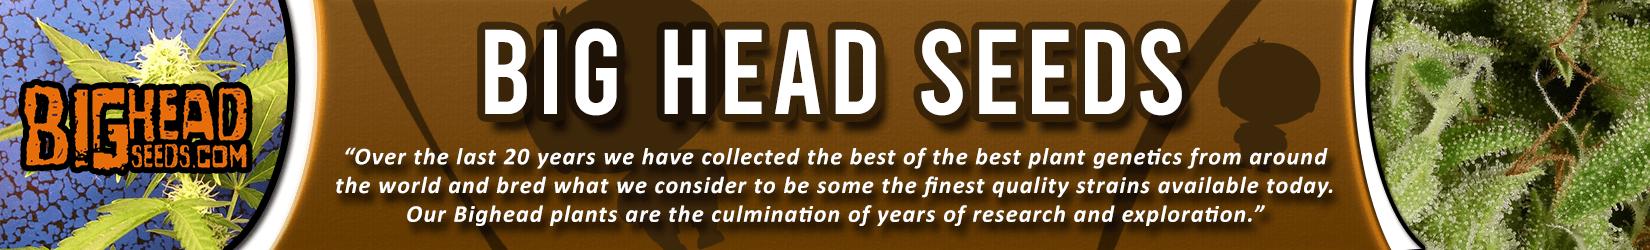 Cannabis Seeds Breeder - Big Head Seeds